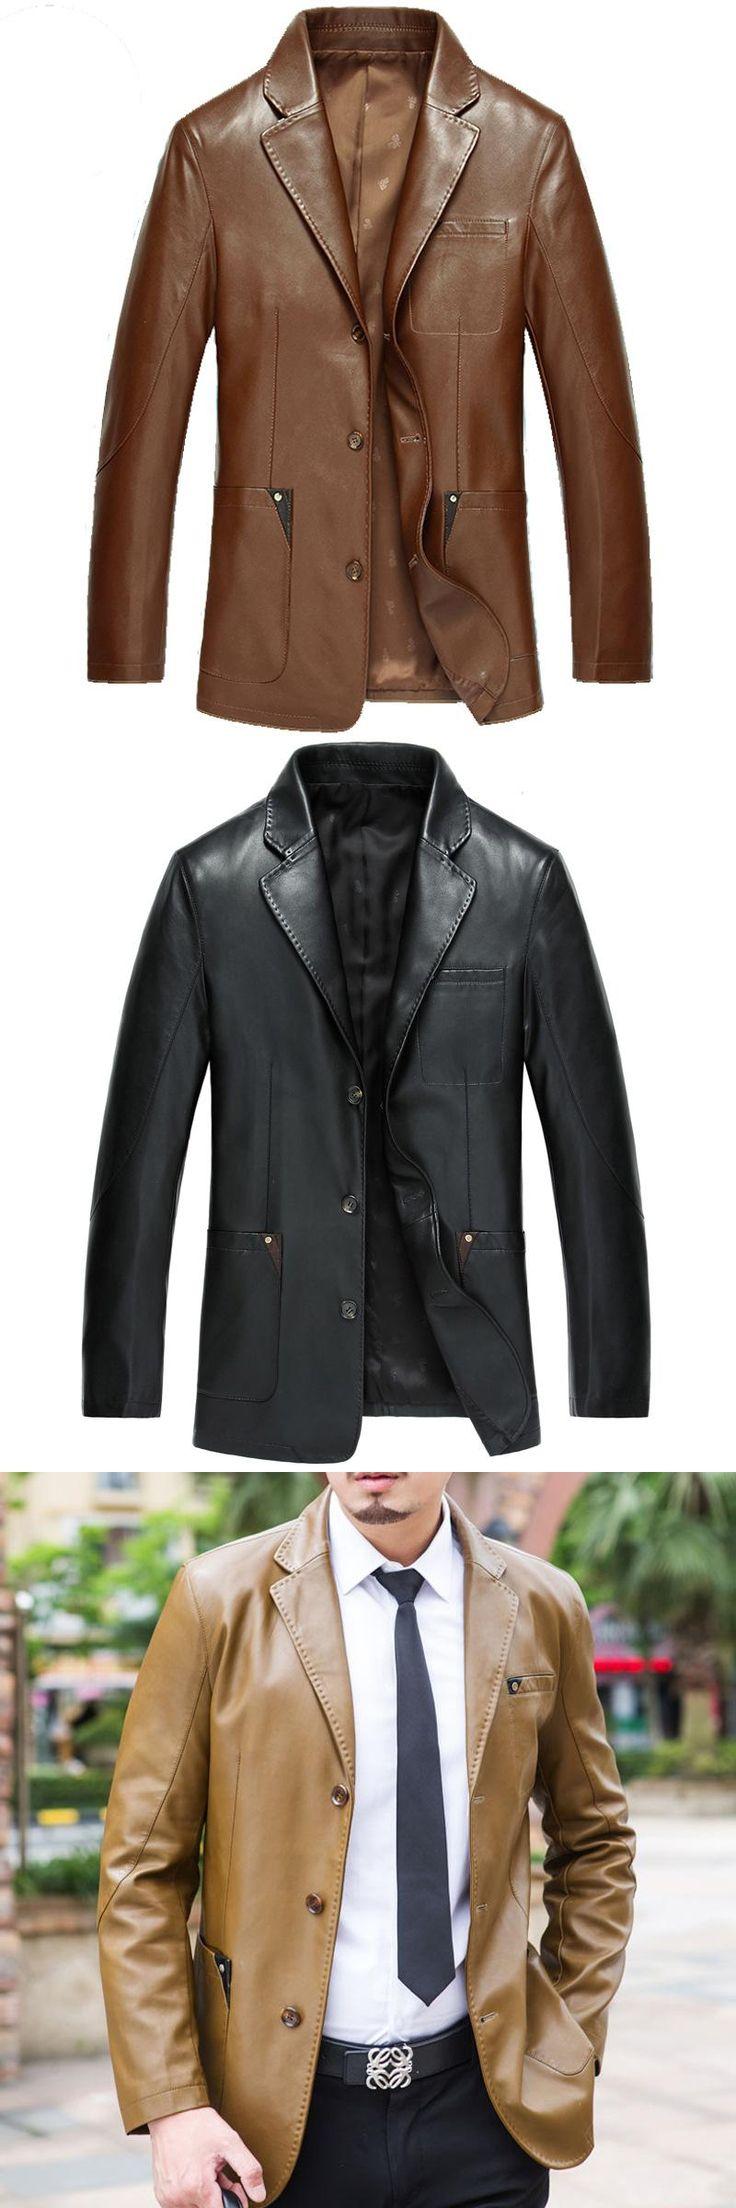 Italy Genuine Leather Sheepskin Jacket Men 2017 Real Lamb Brown Male Pilot Moto Aviator Coat Autumn Overcoat UK Suede Outwear US